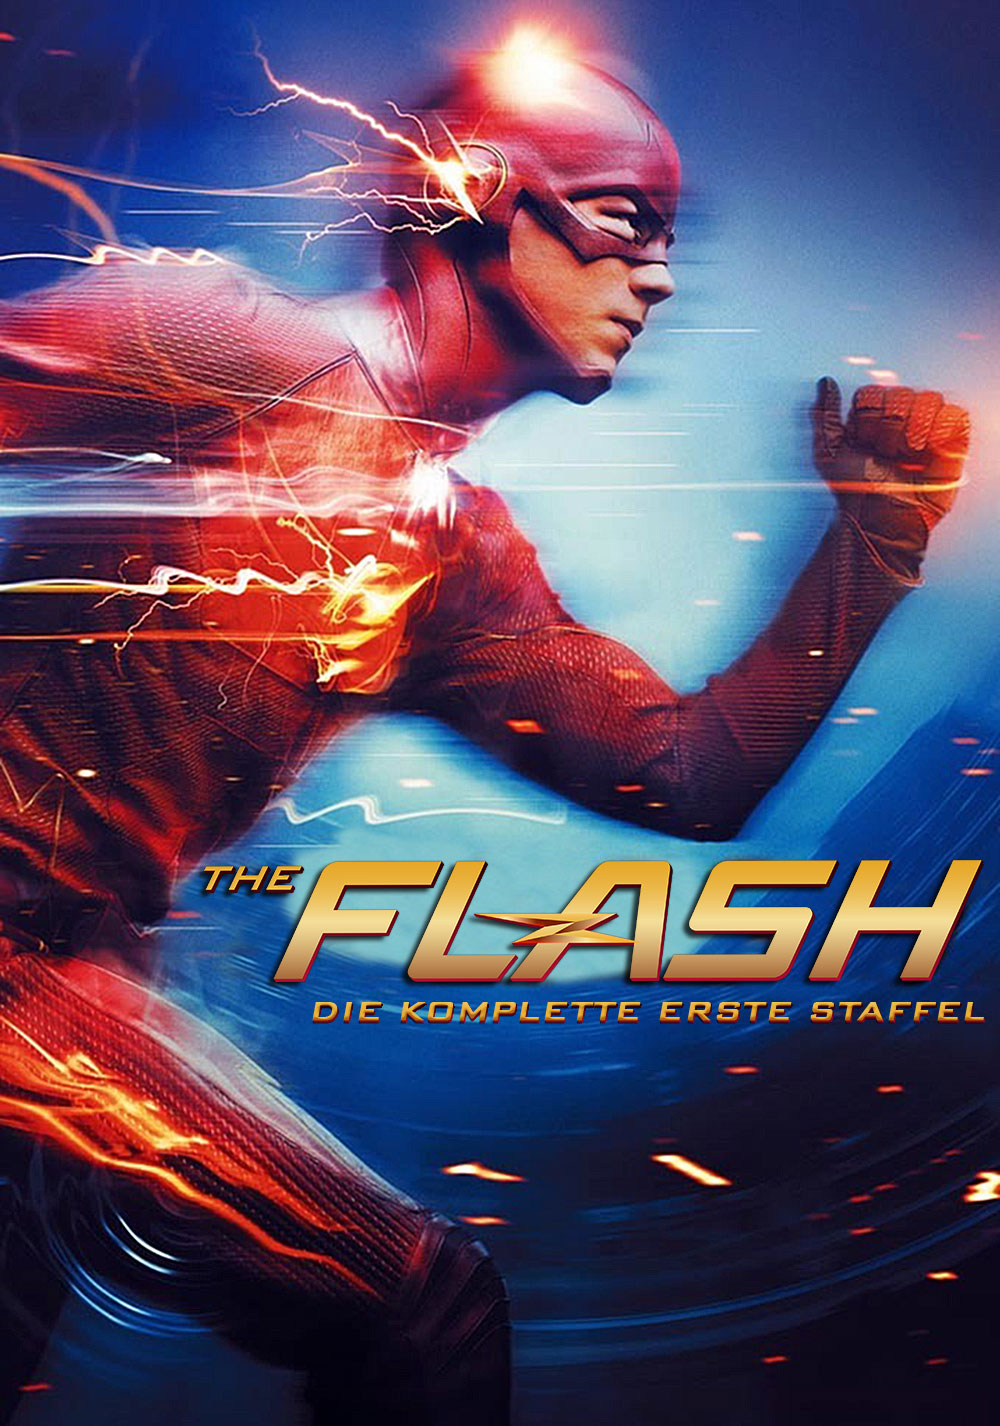 The Flash Tv Series Besetzung